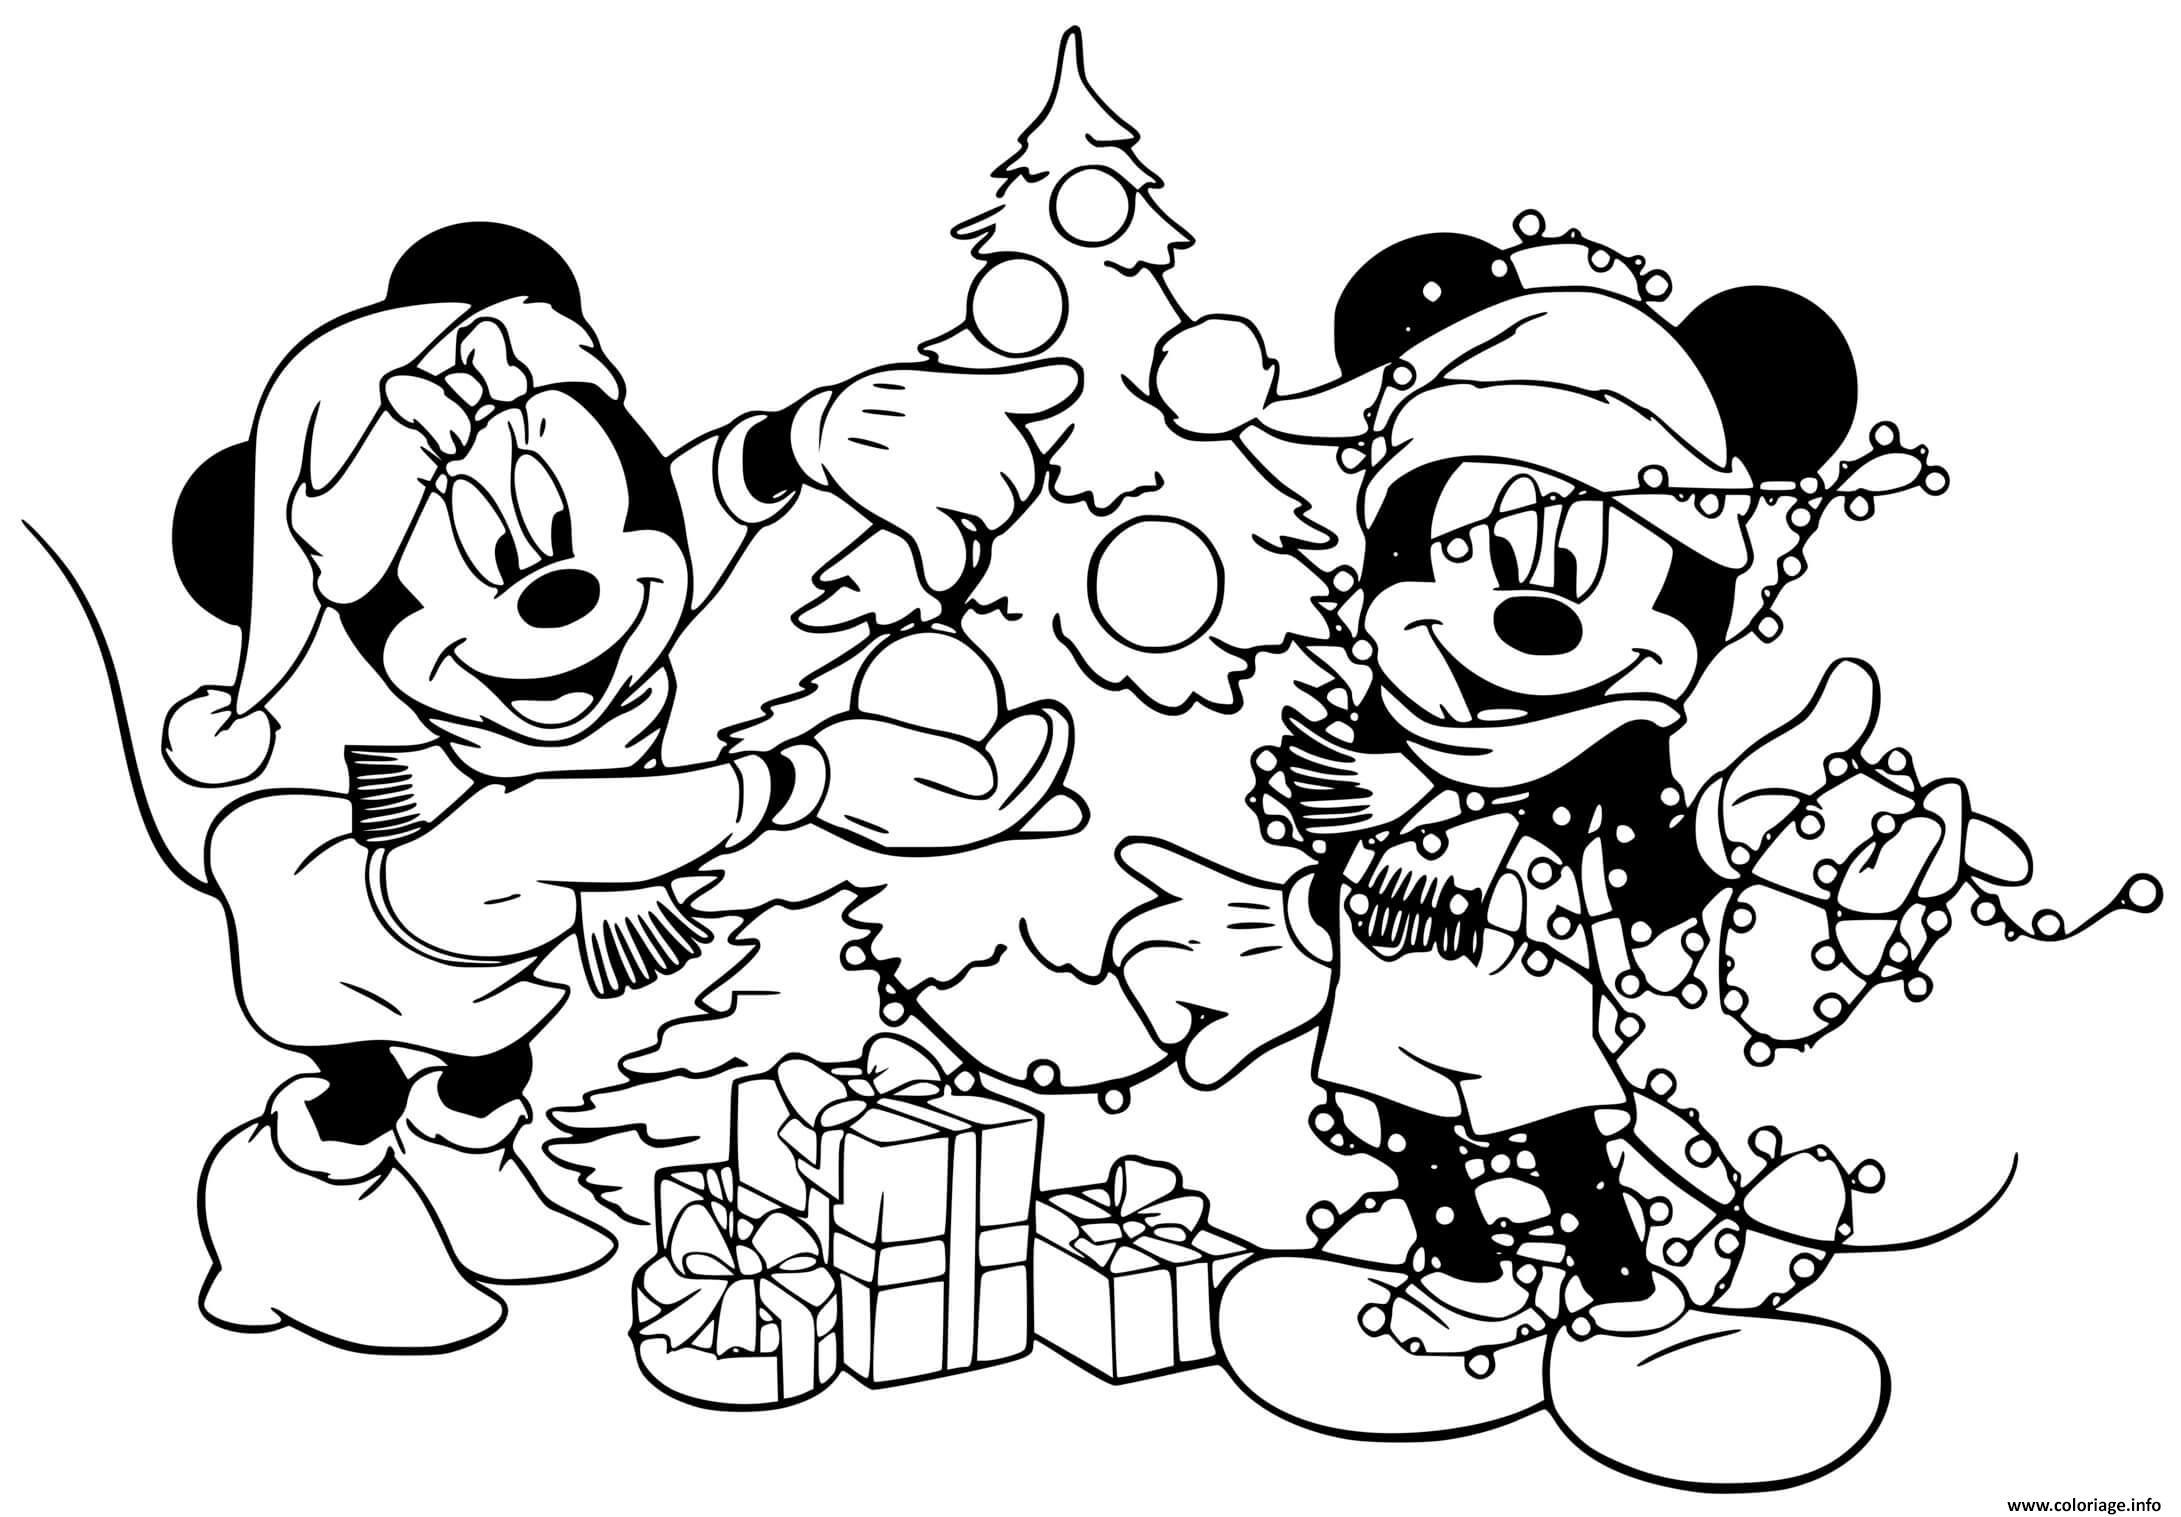 Coloriage Mickey Minnie Decorating Tree Dessin Noel Disney A Imprimer